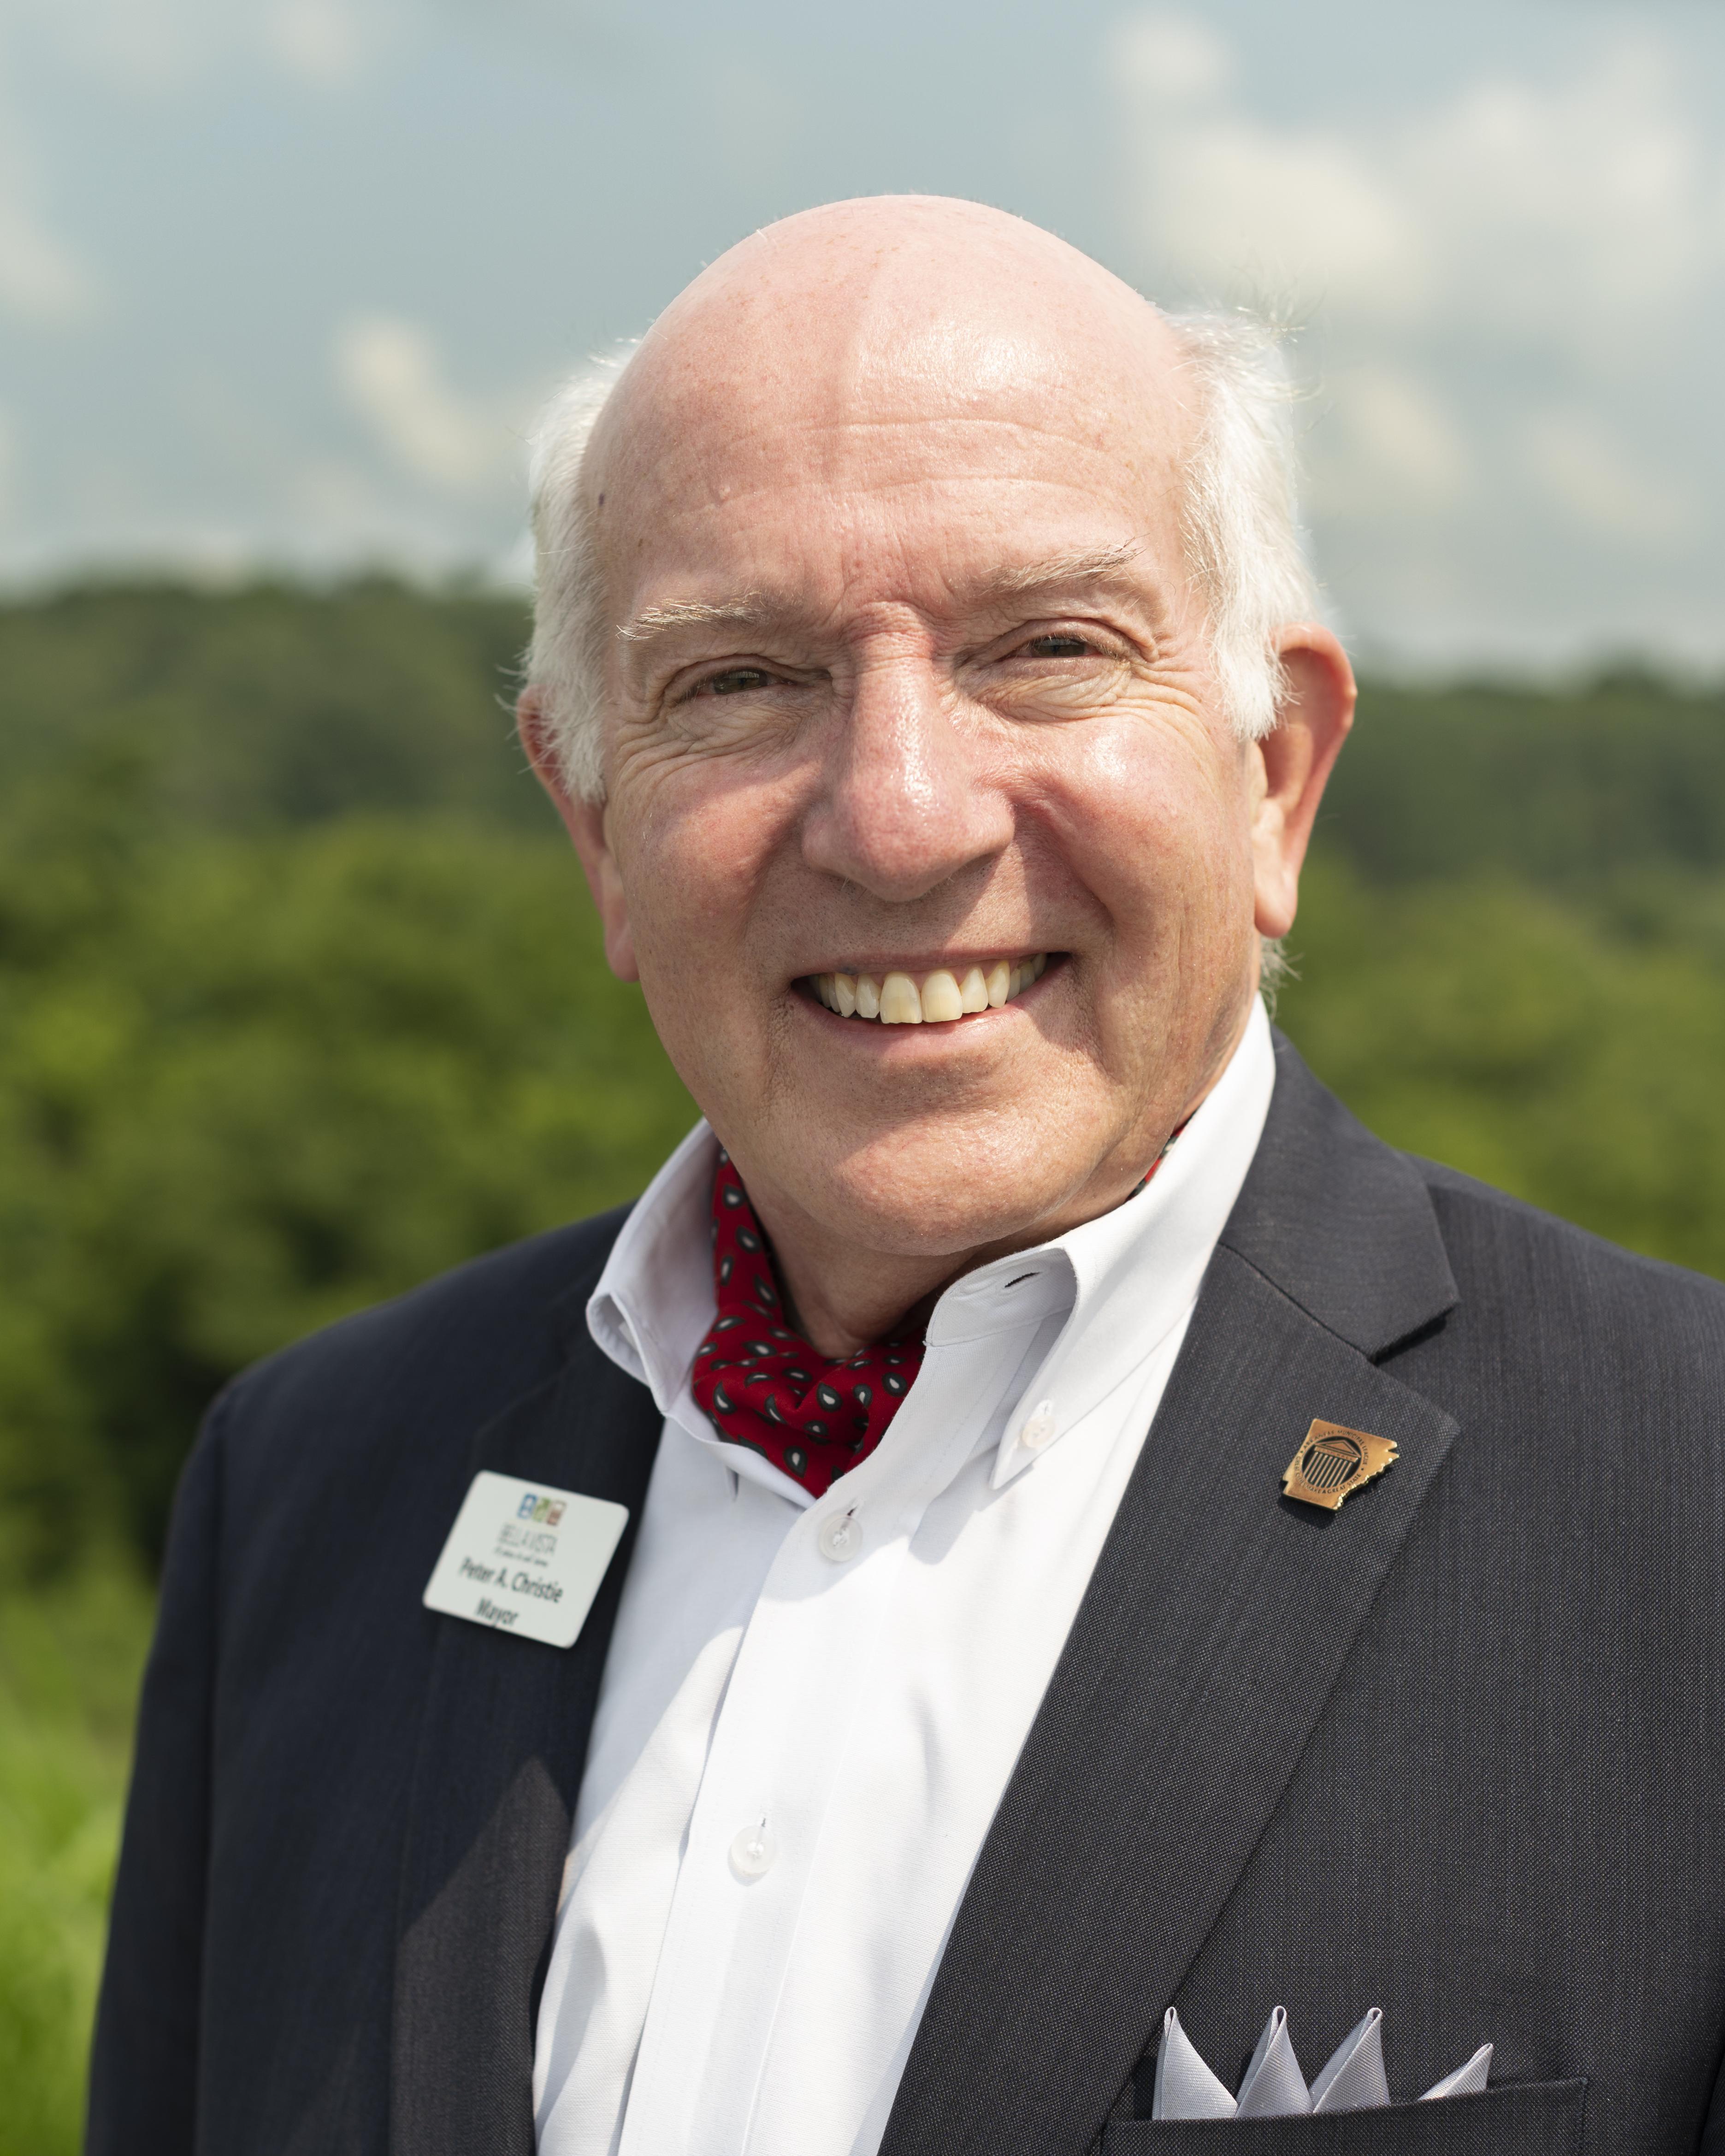 Mayor Peter A. Christie